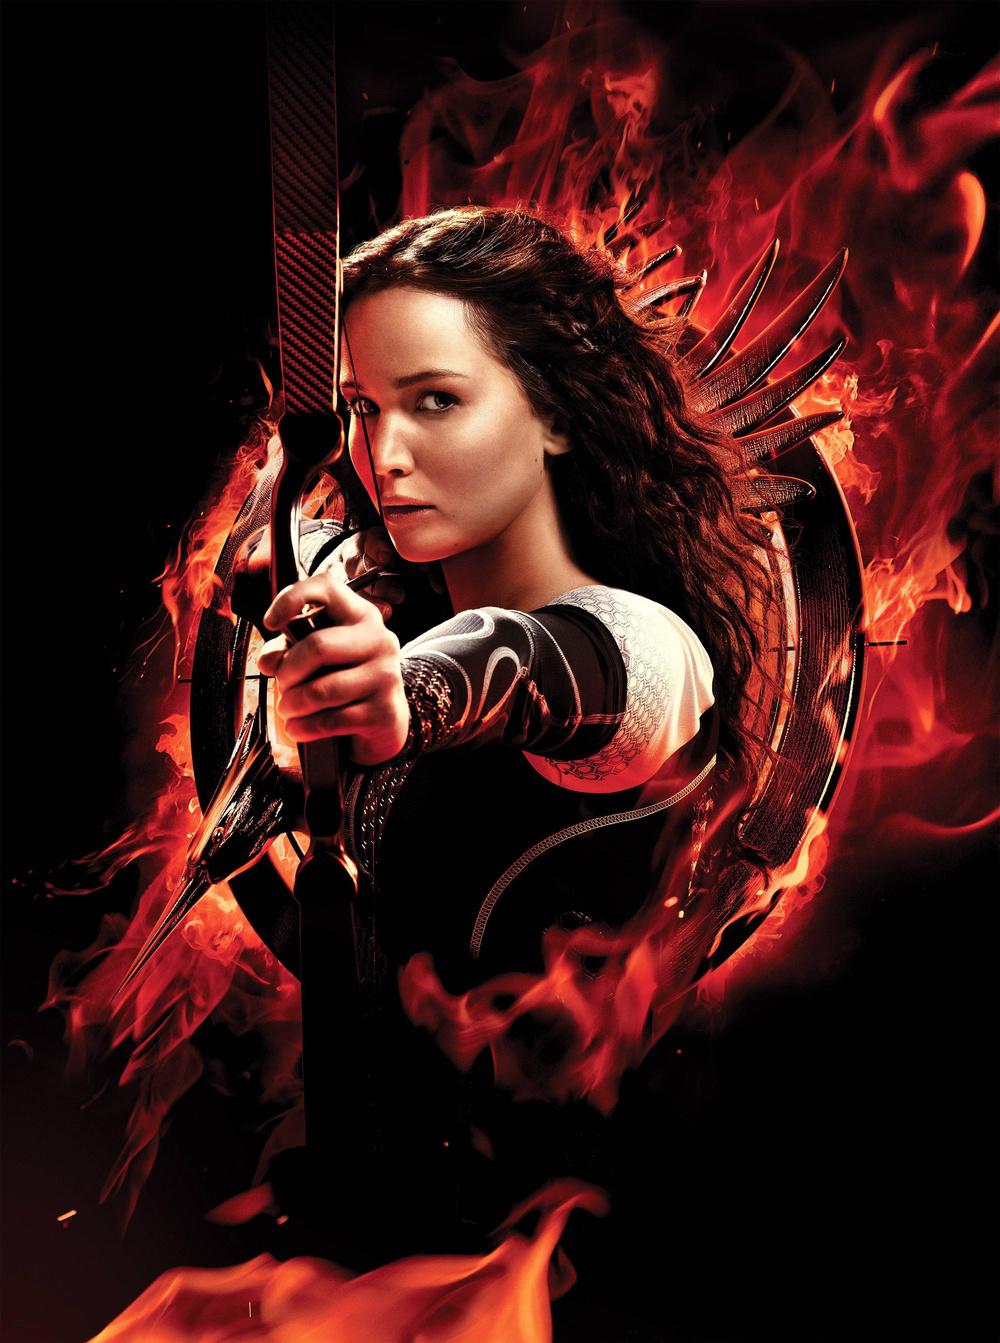 katniss-everdeen-kills-everything-video-movie-edit.jpg